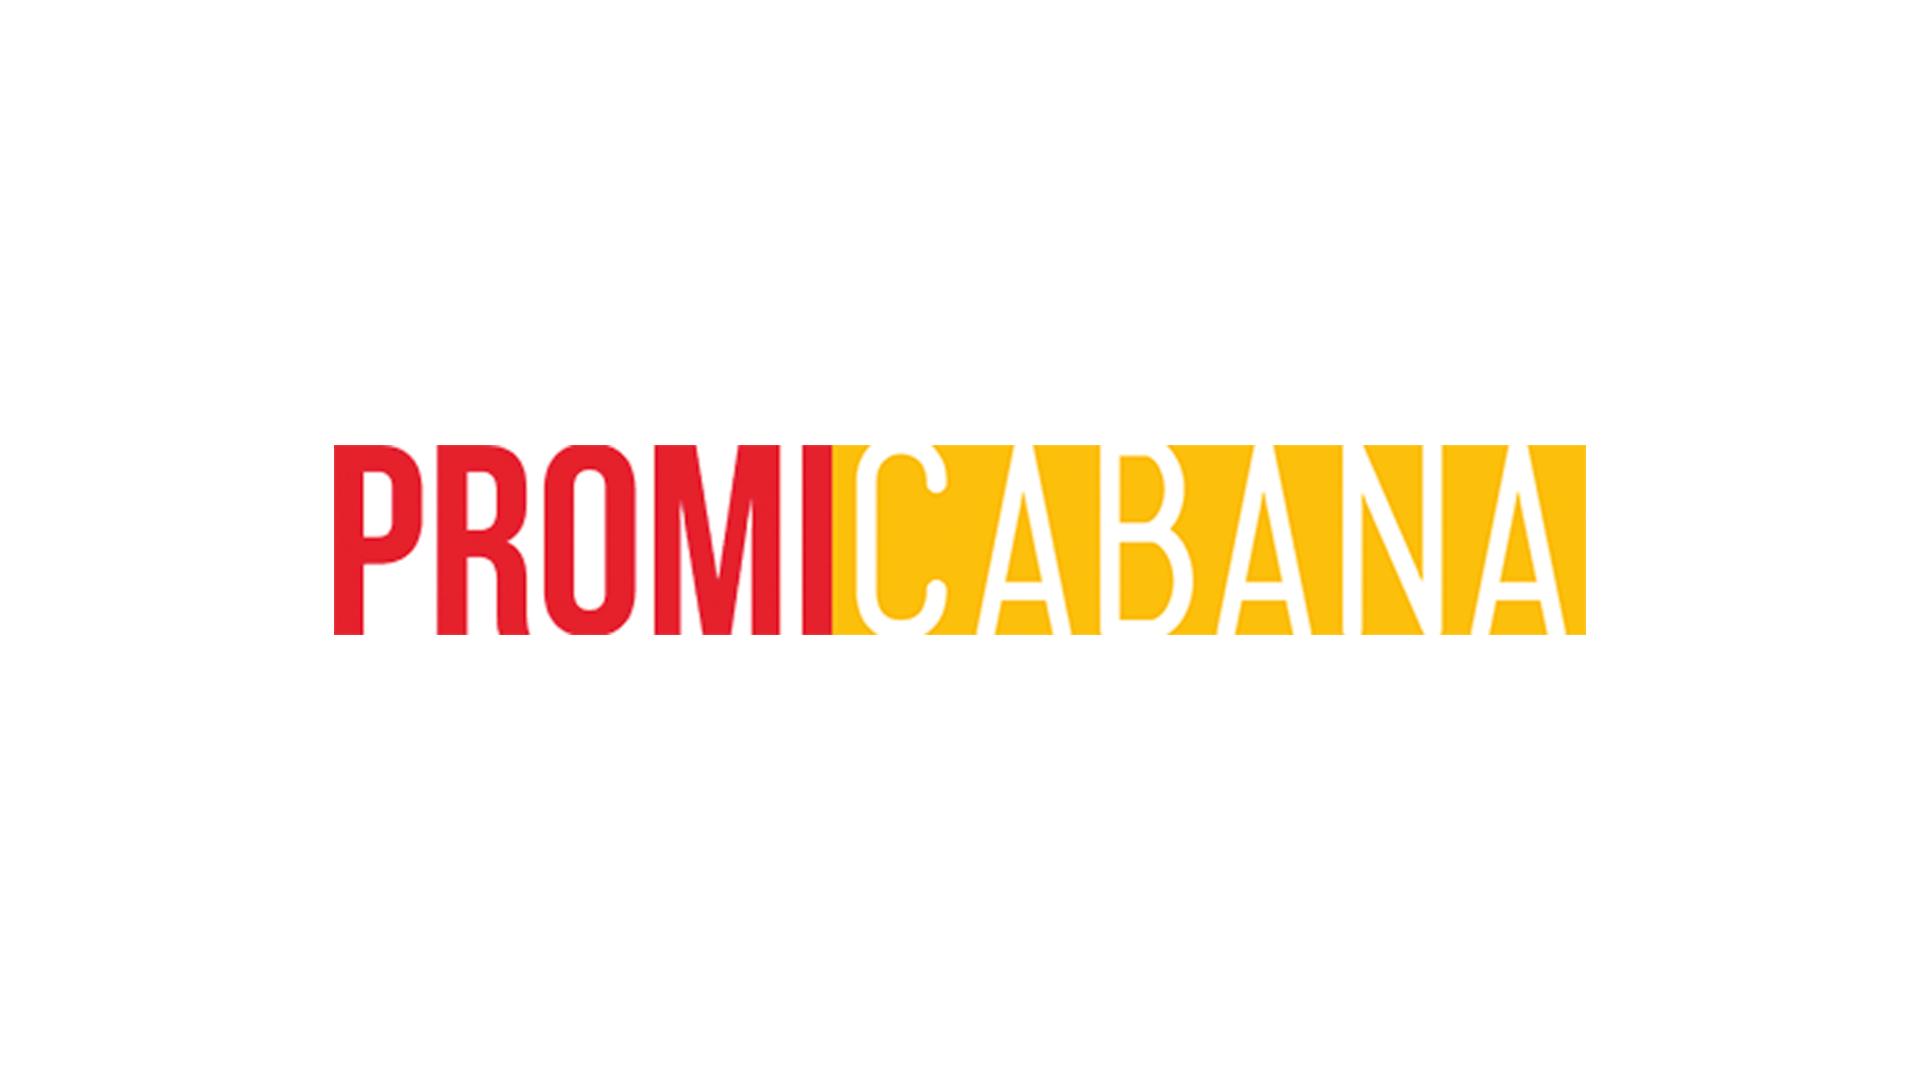 Evangeline-Lilly-Tauriel-Hobbit-Desolation-of-Smaug